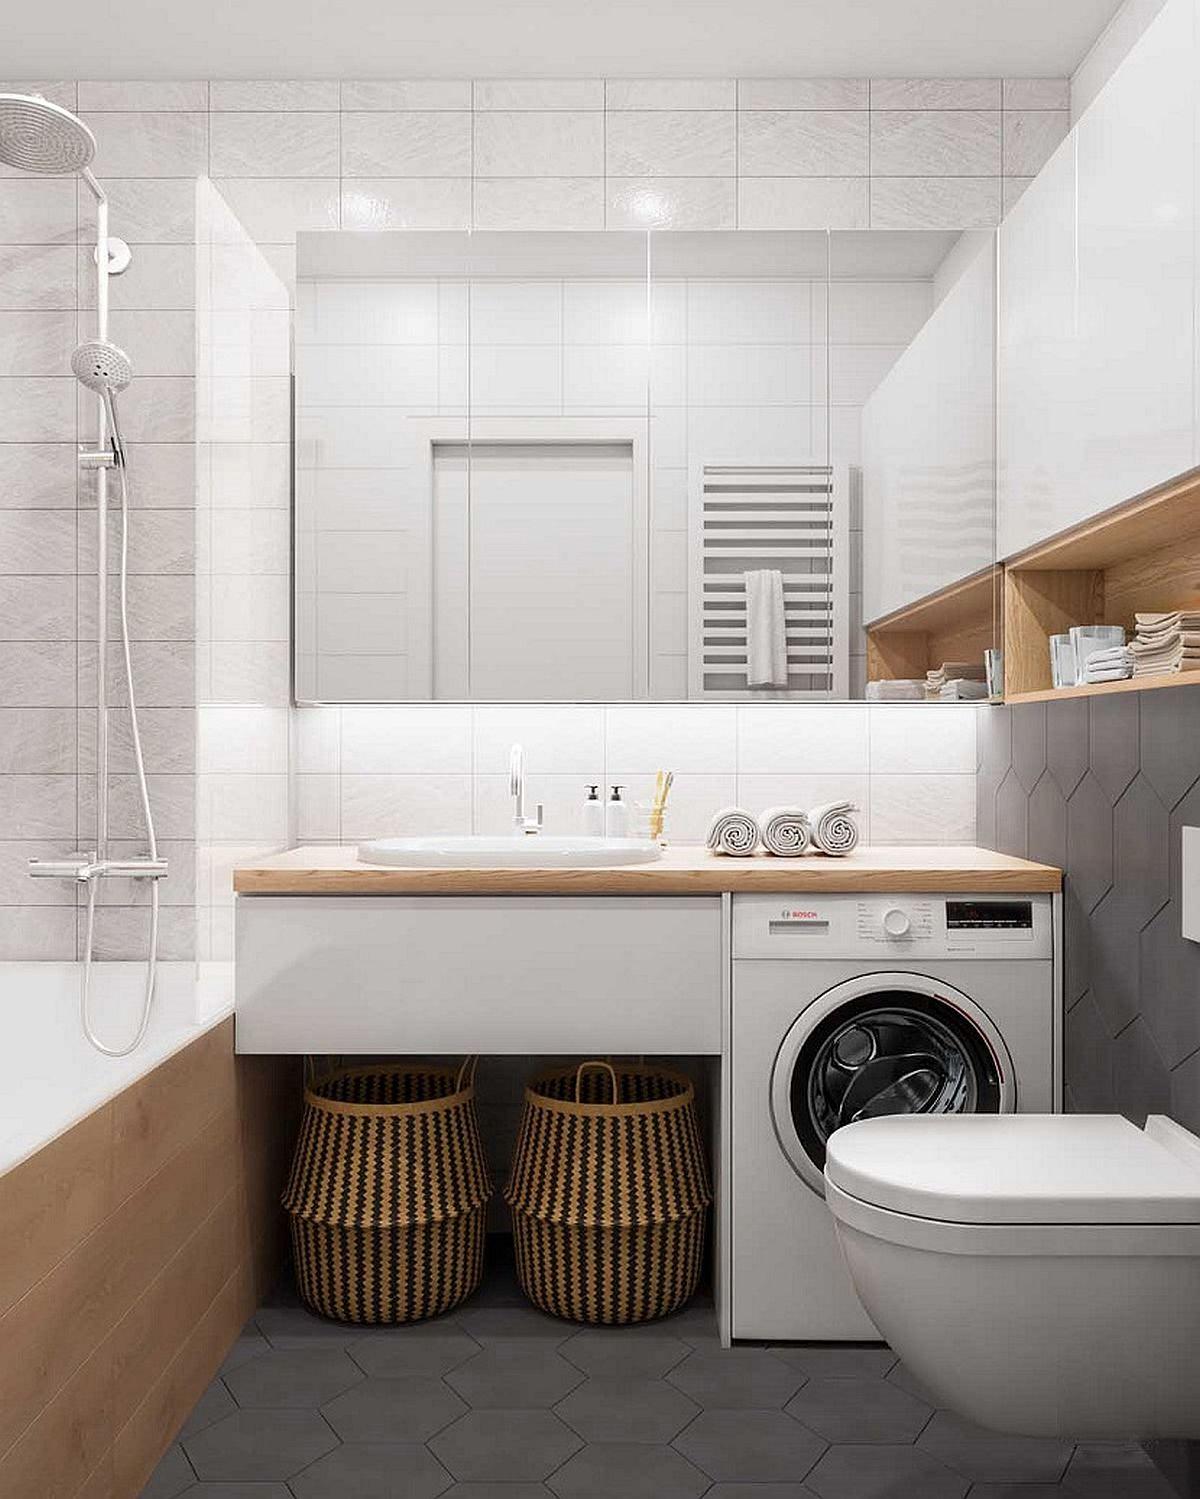 adelaparvu.com despre masina de spalat rufe in baie (7)